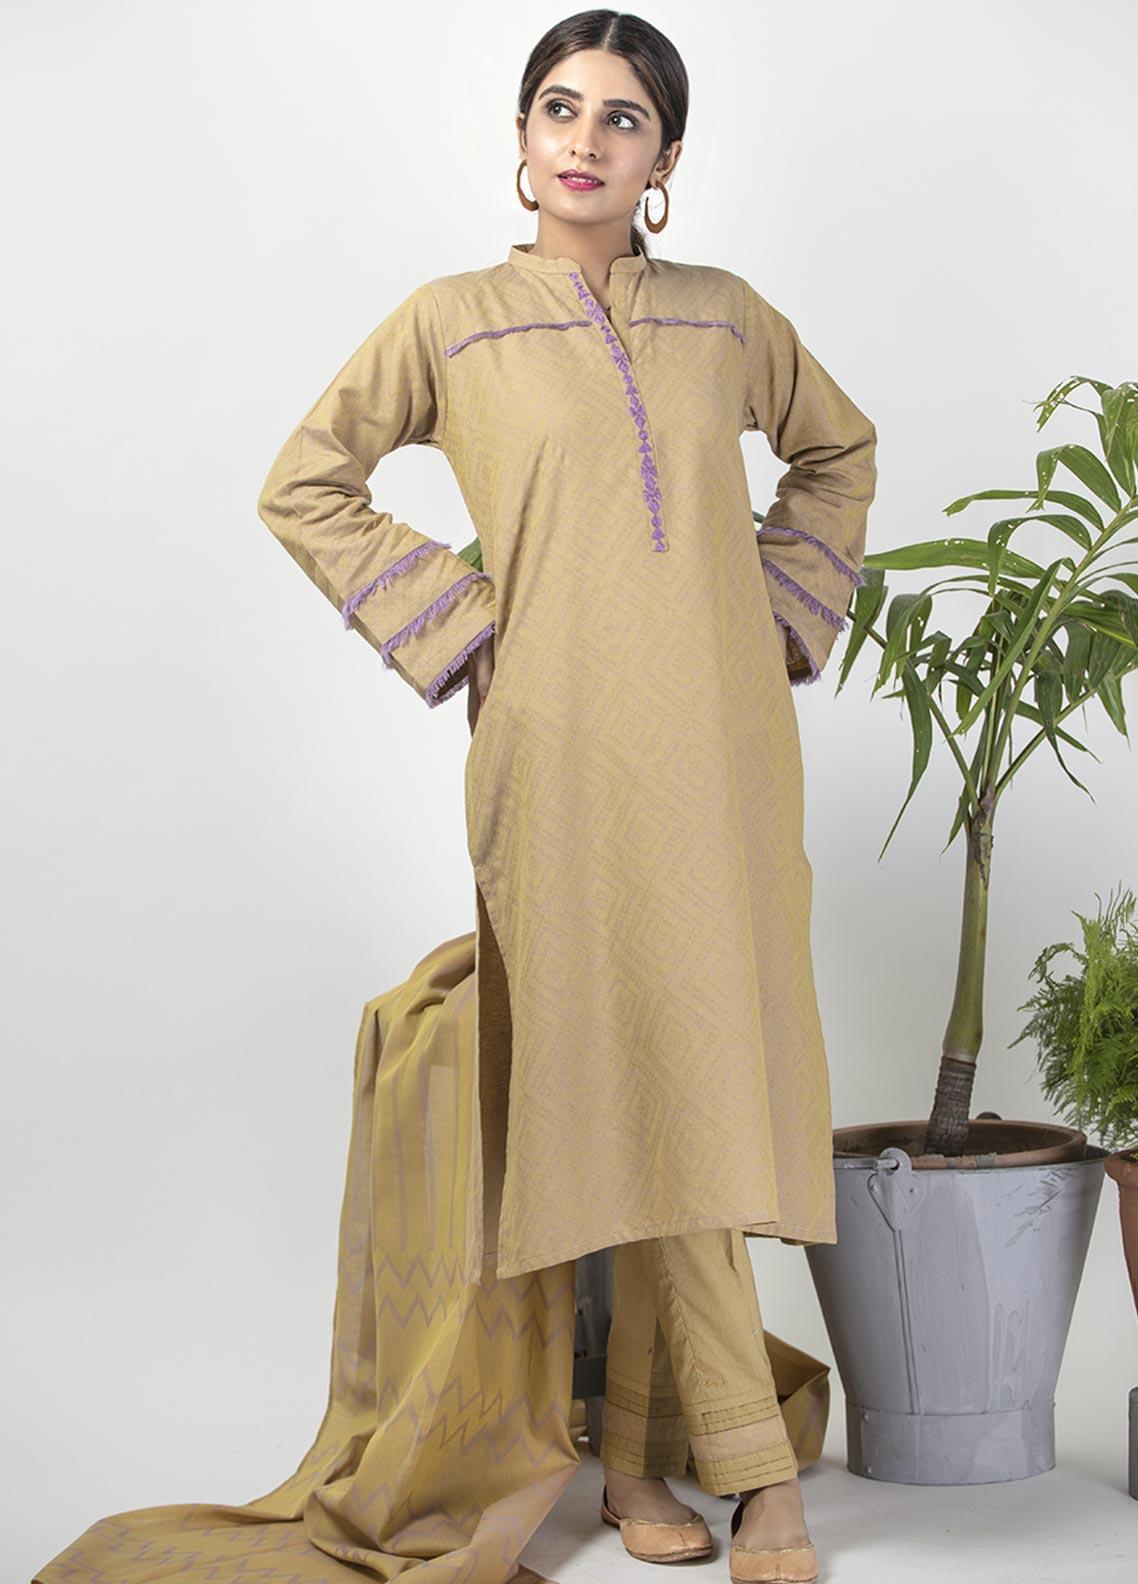 Senorita Casual Cotton Stitched 3 Piece Suit LBD-01406-YELLOW - PURPLE